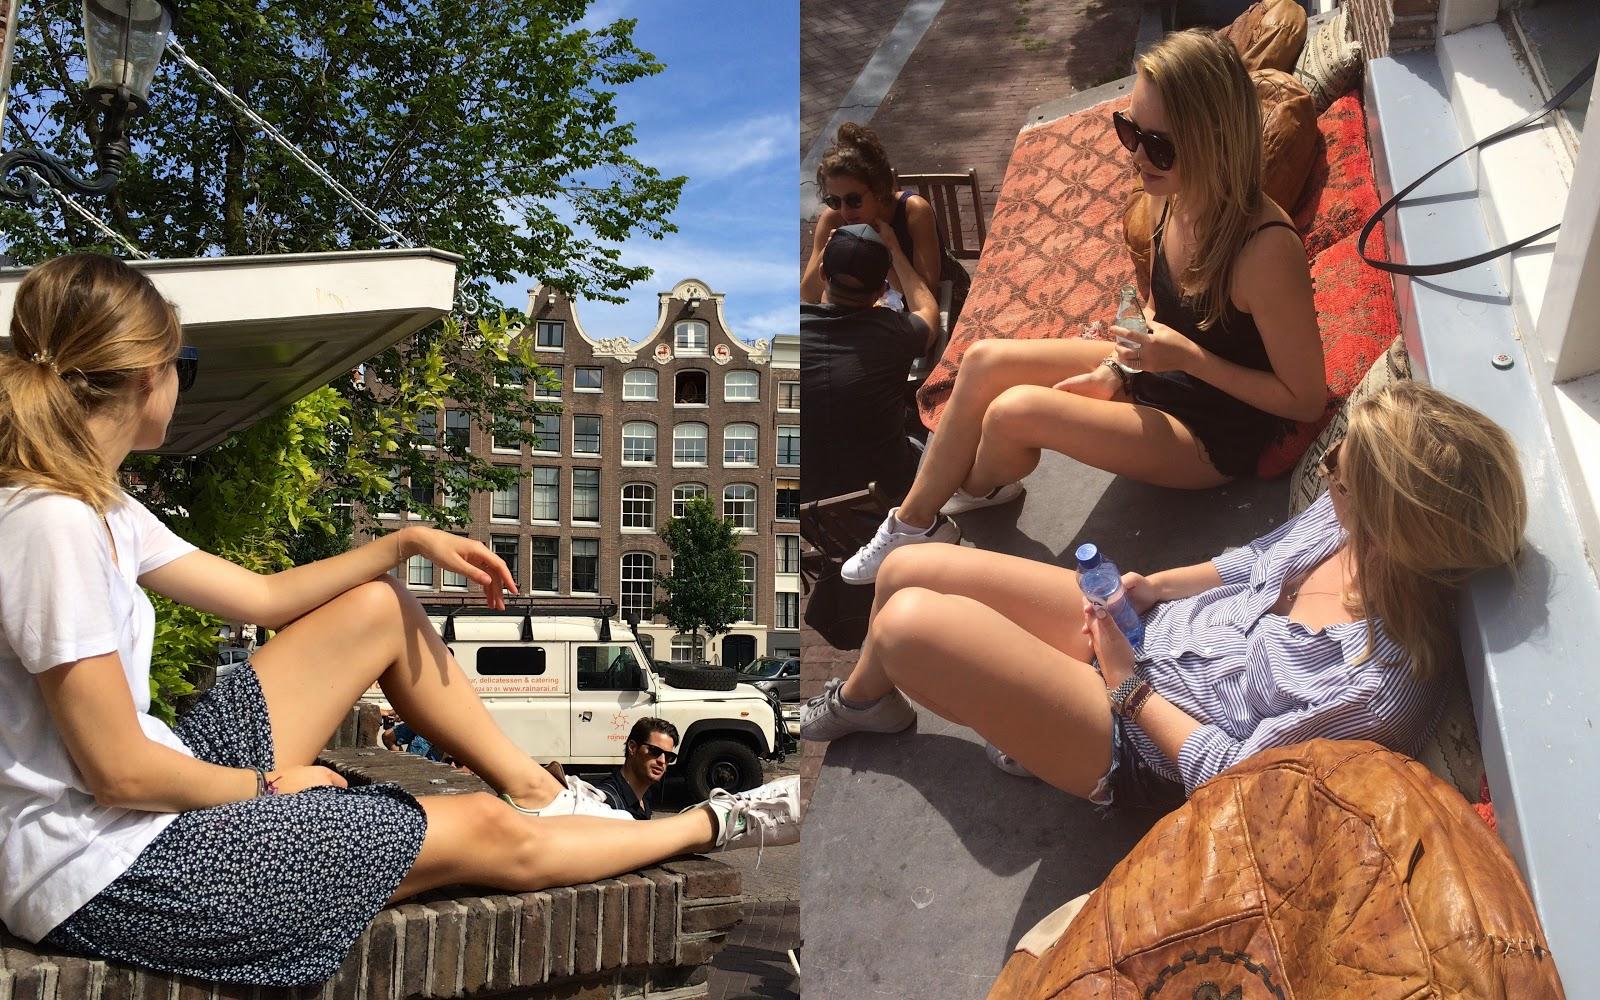 Rainarai Amsterdam Hotspot Guide